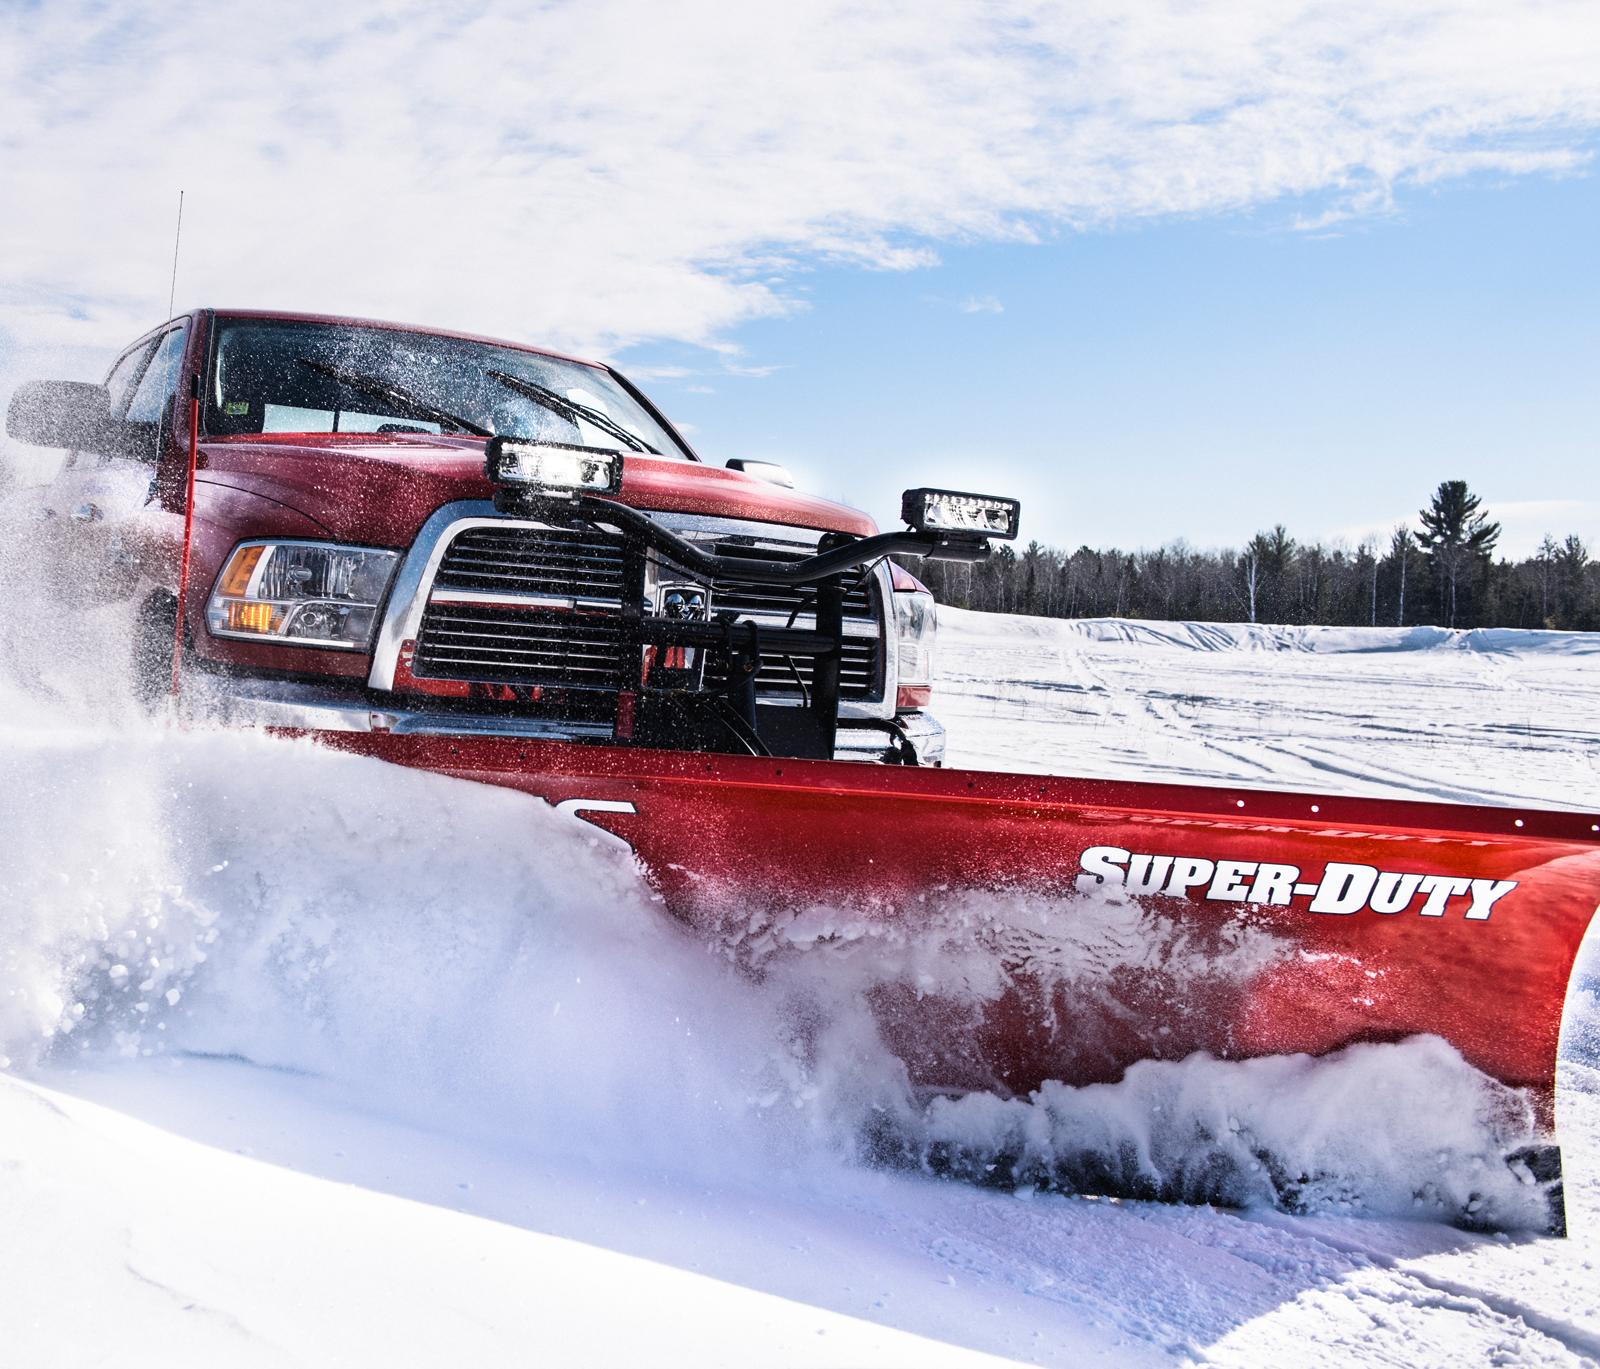 super duty plows boss snowplowboss plow wiring diagram ford f650 18 [ 1600 x 1369 Pixel ]